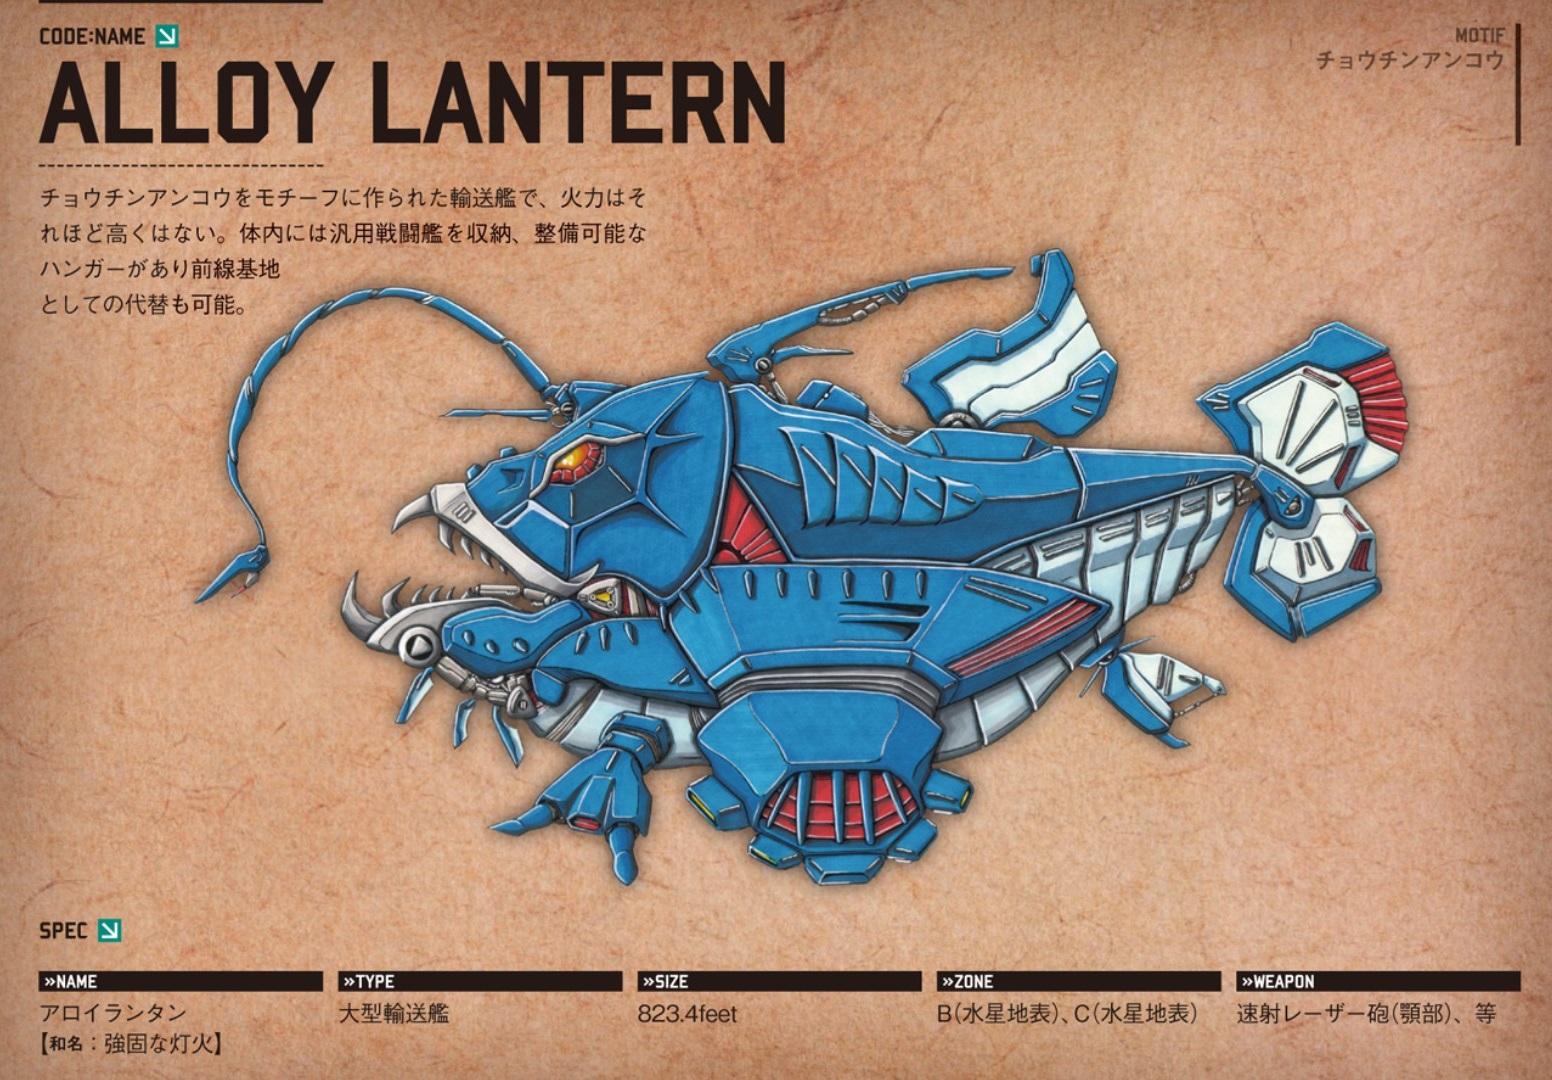 Alloy Lantern